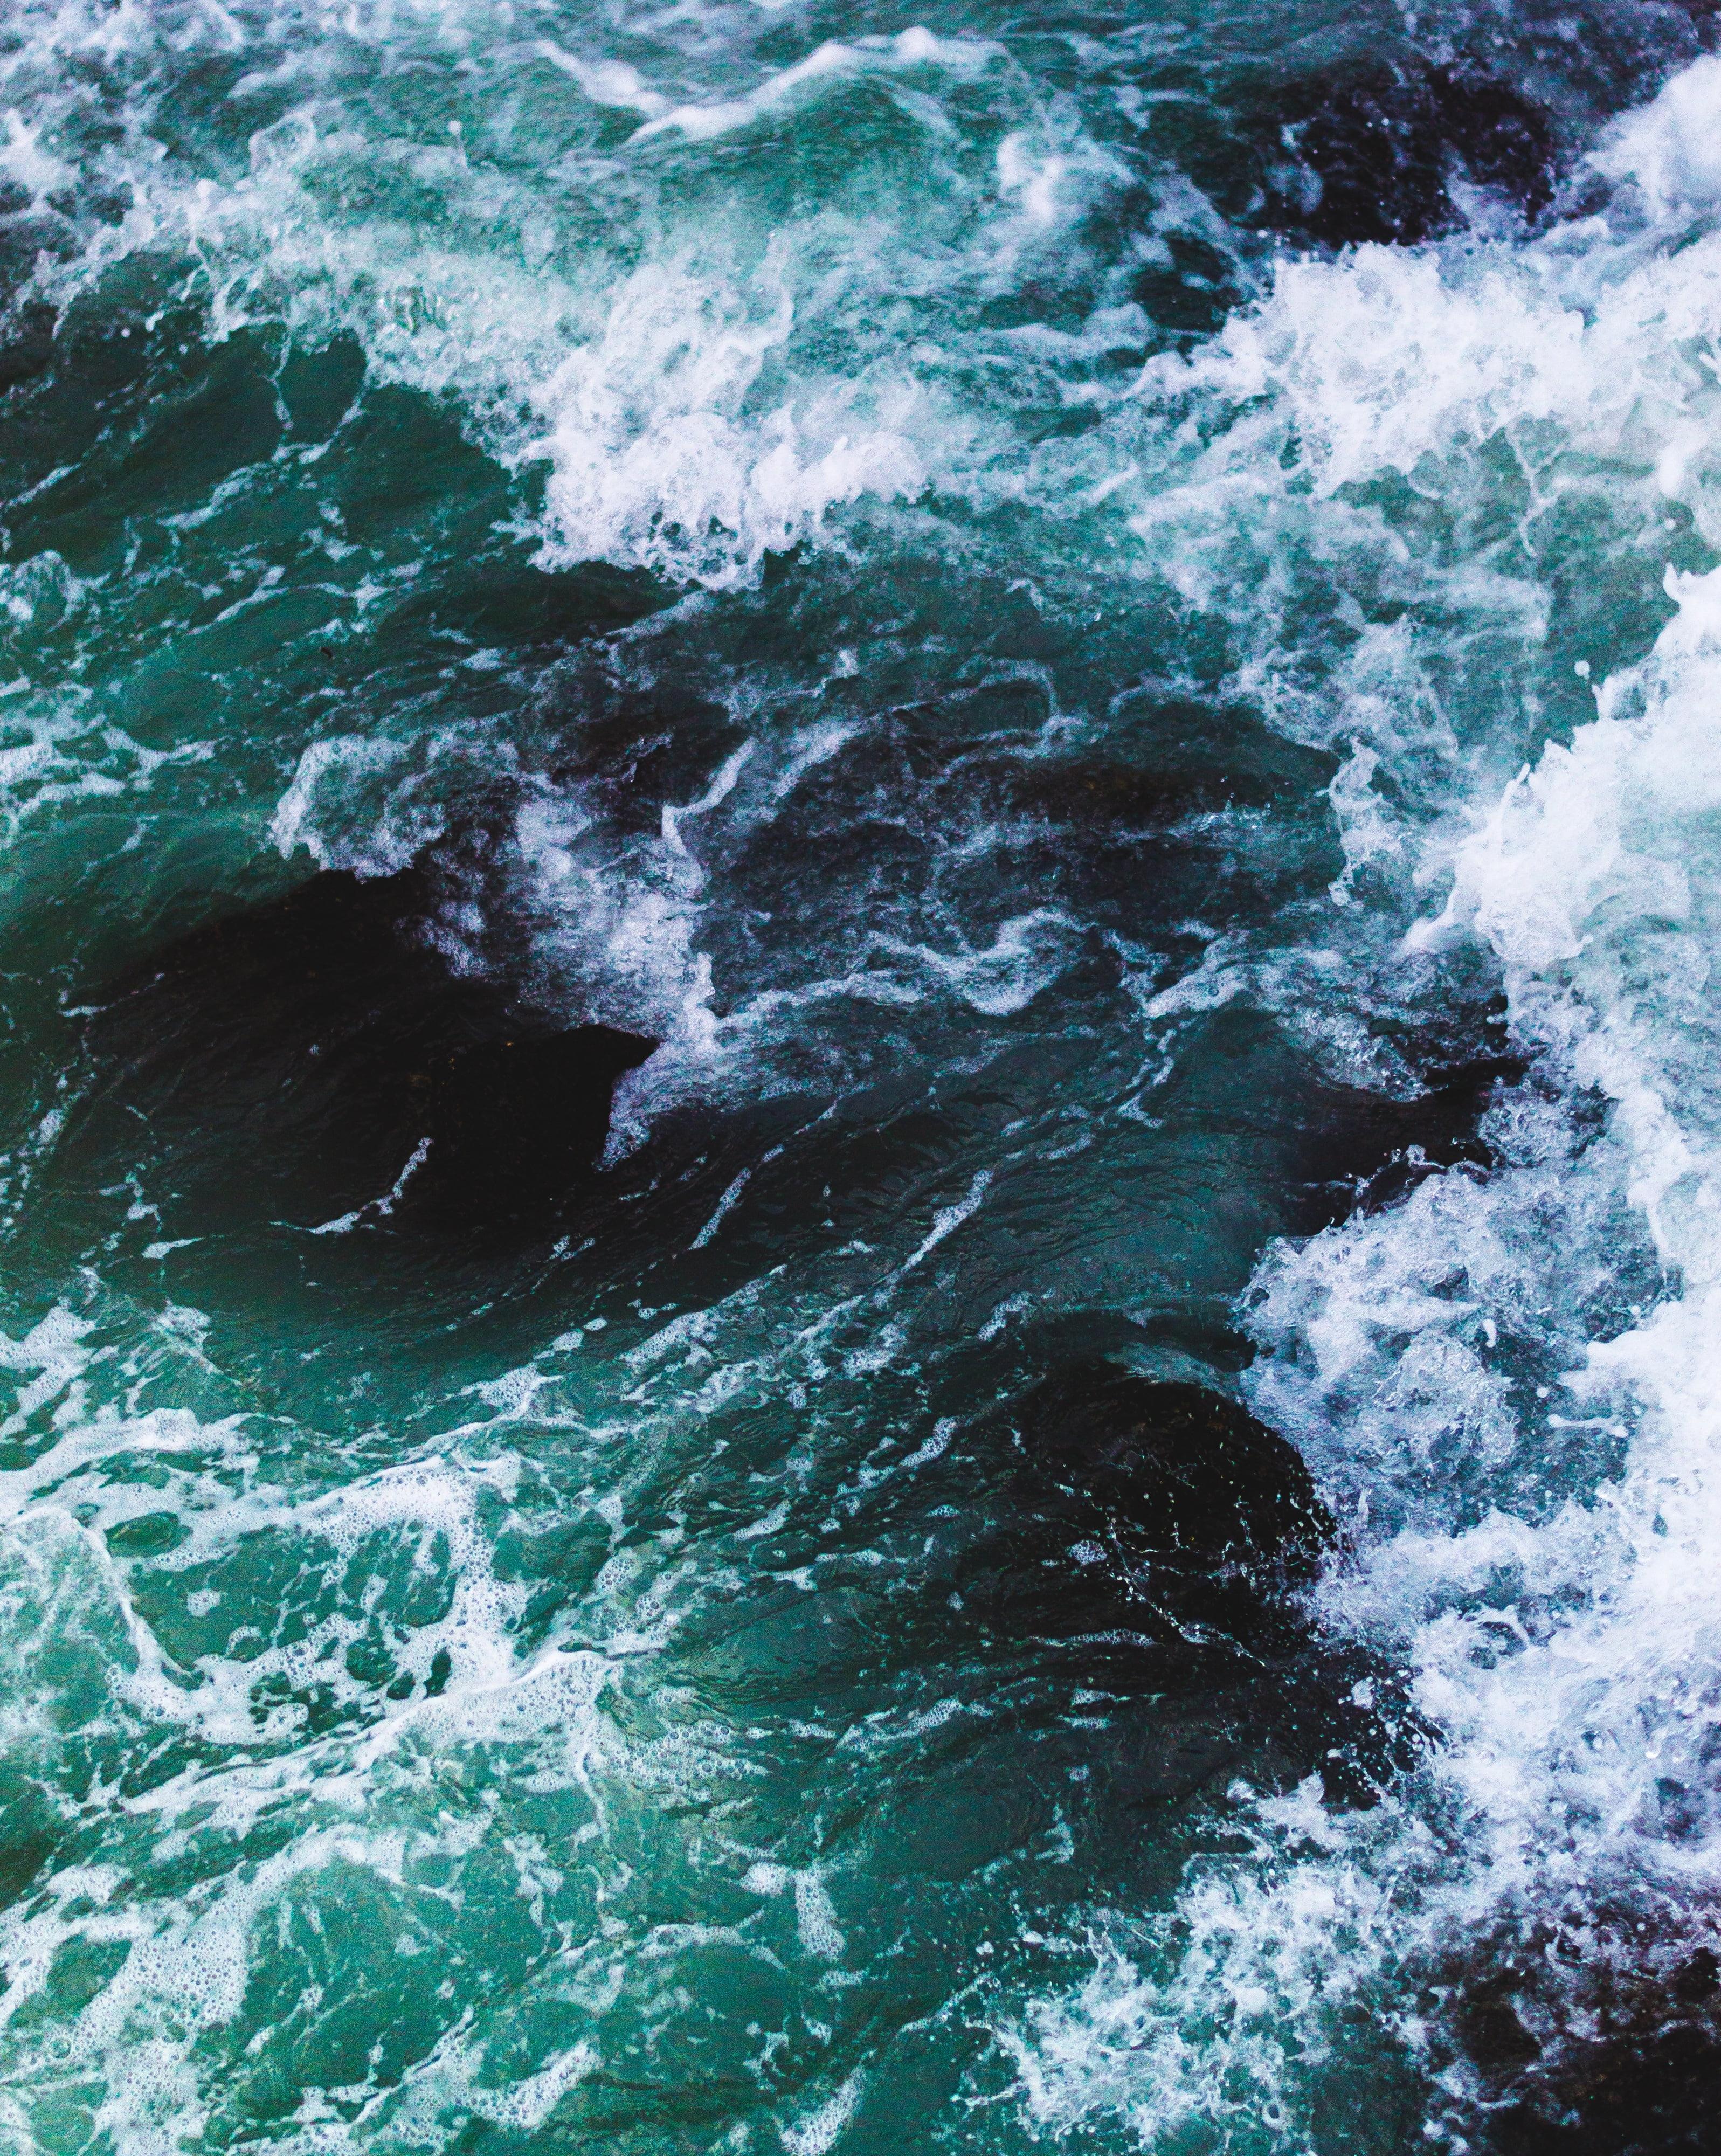 Ocean Waves Wallpaper 166834 - Samsung S8 Wallpaper Sea , HD Wallpaper & Backgrounds